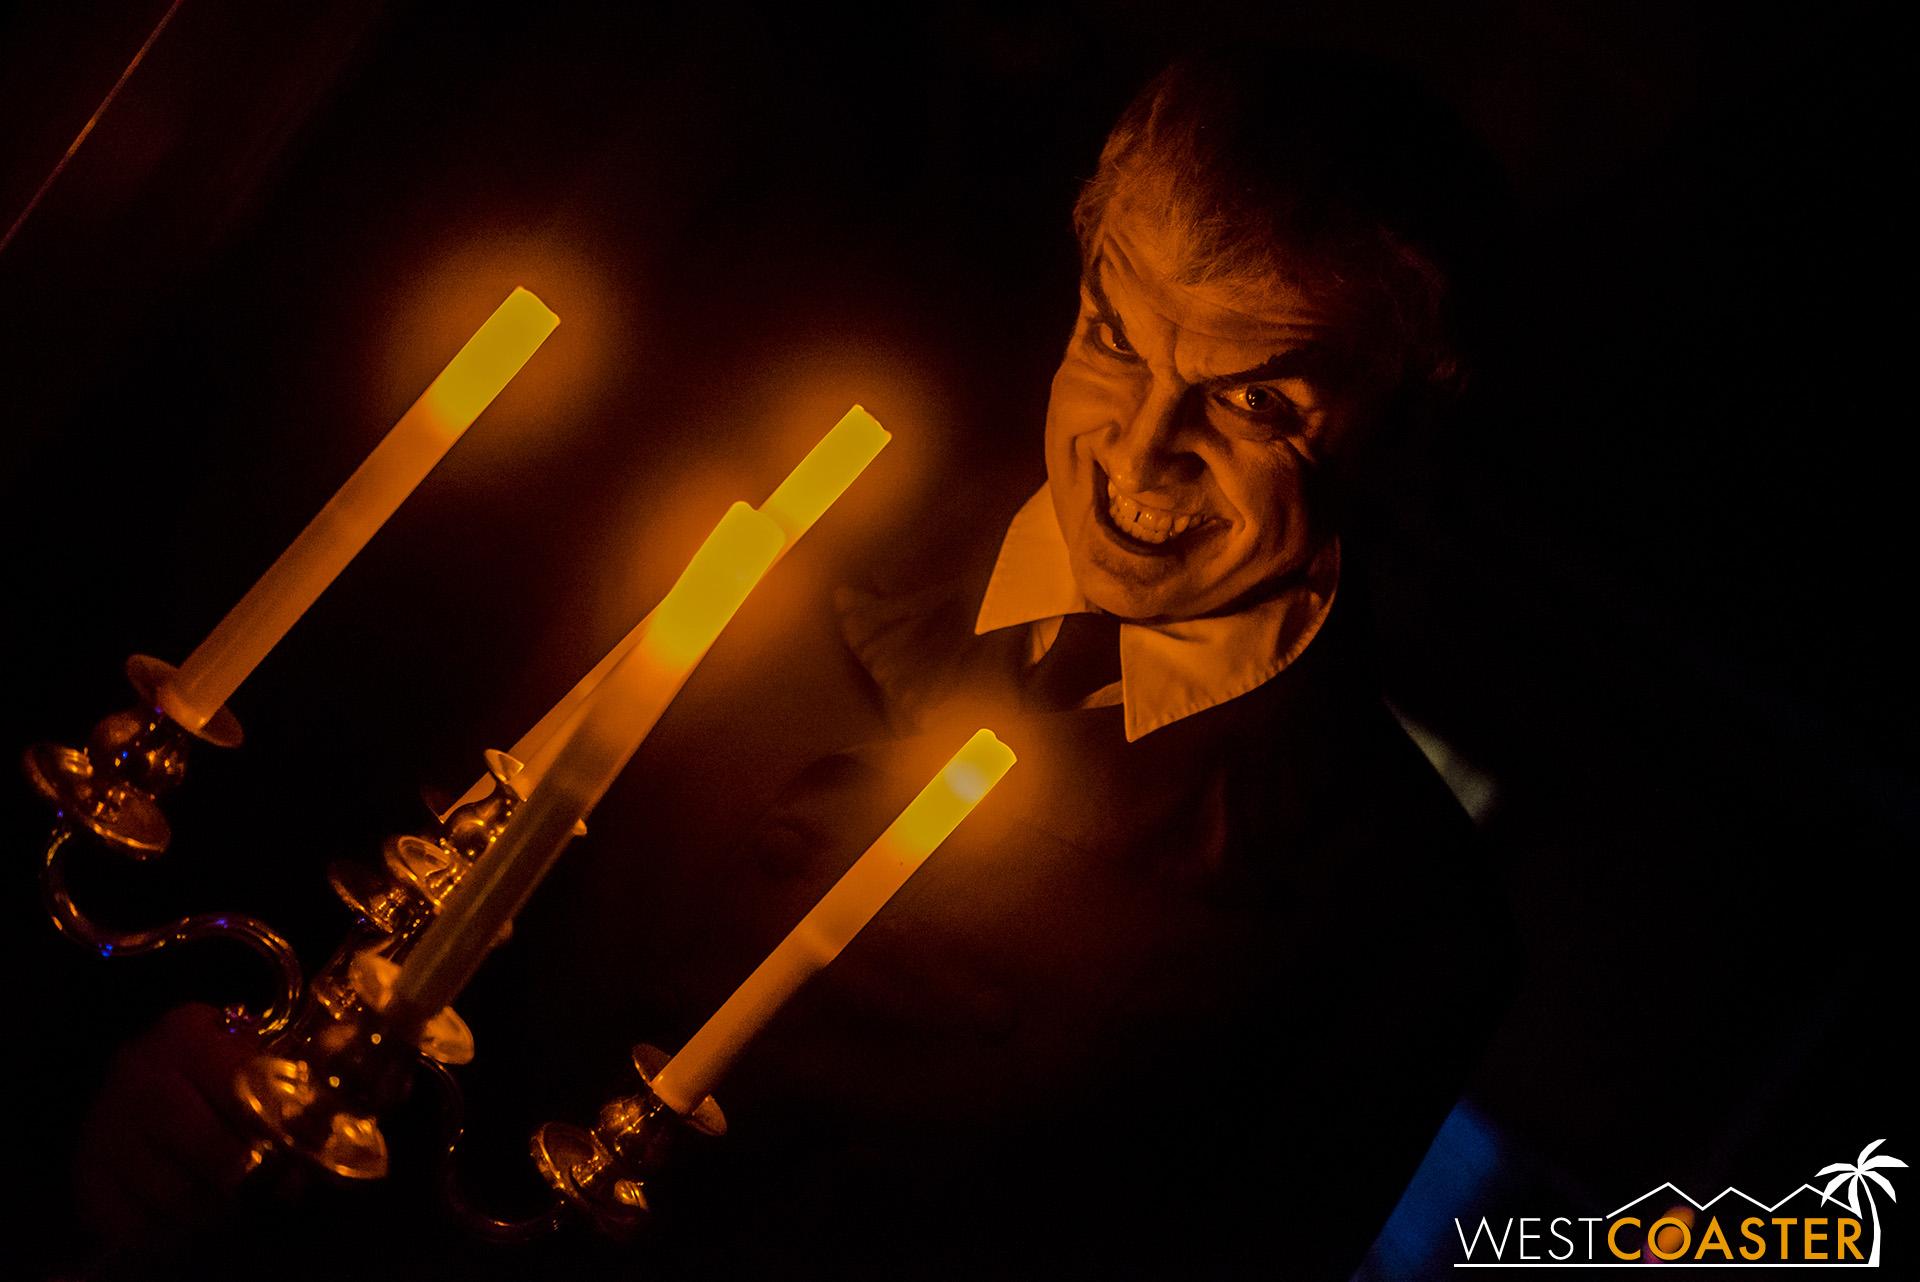 Peter Overstreet and the Winchester Mystery House promise plenty of shrieks this Halloween season!